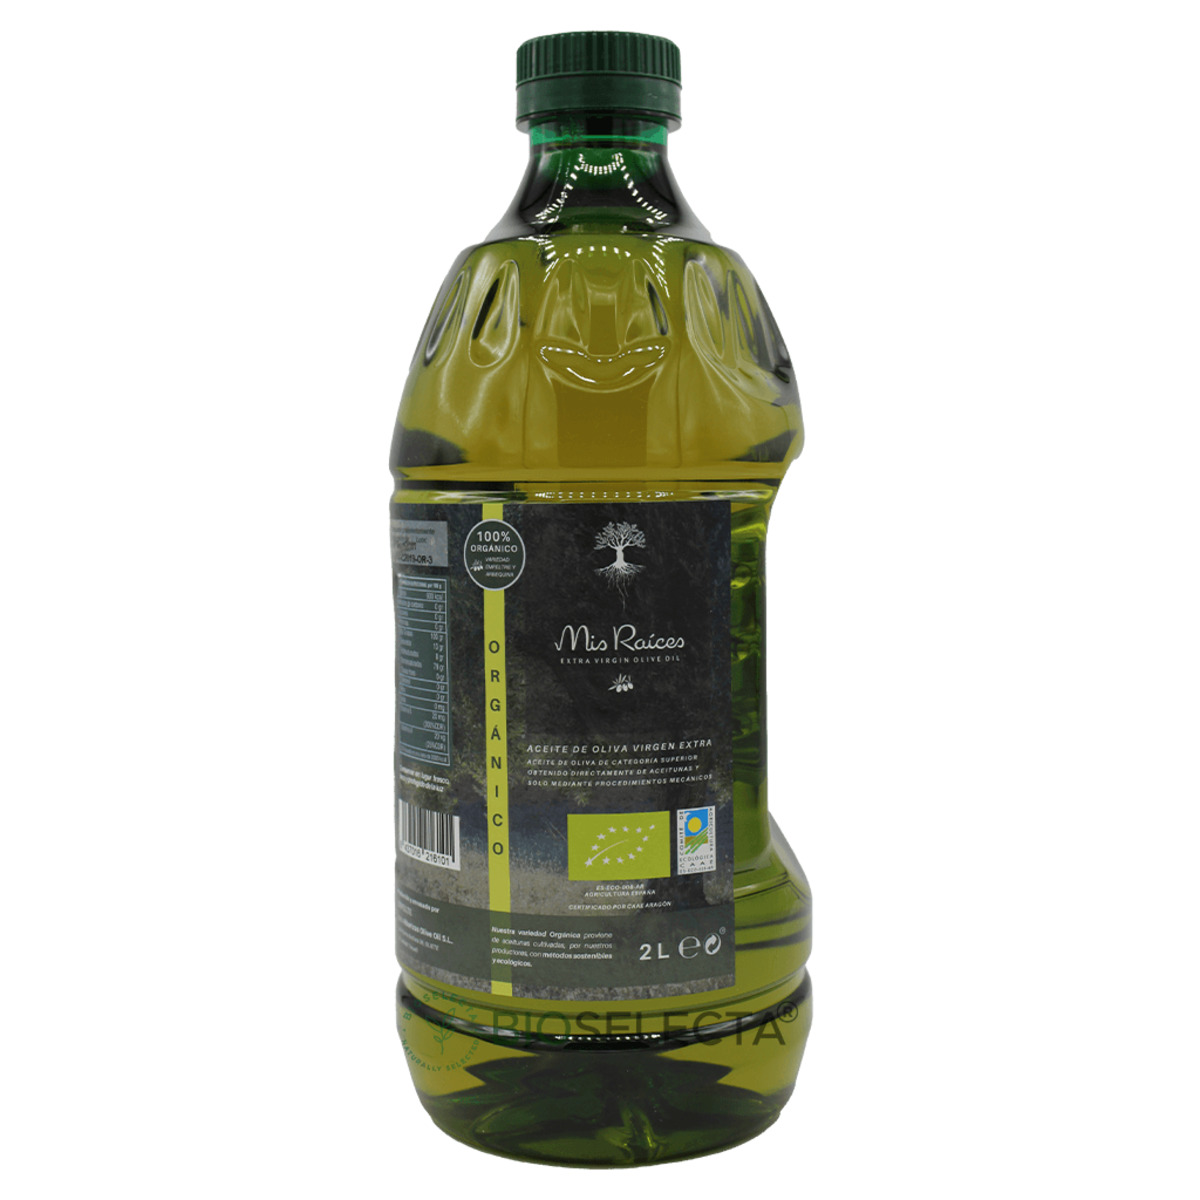 Aceite de oliva virgen extra. Mis raíces organic 2l pet. Bio. (Oliete. Teruel)